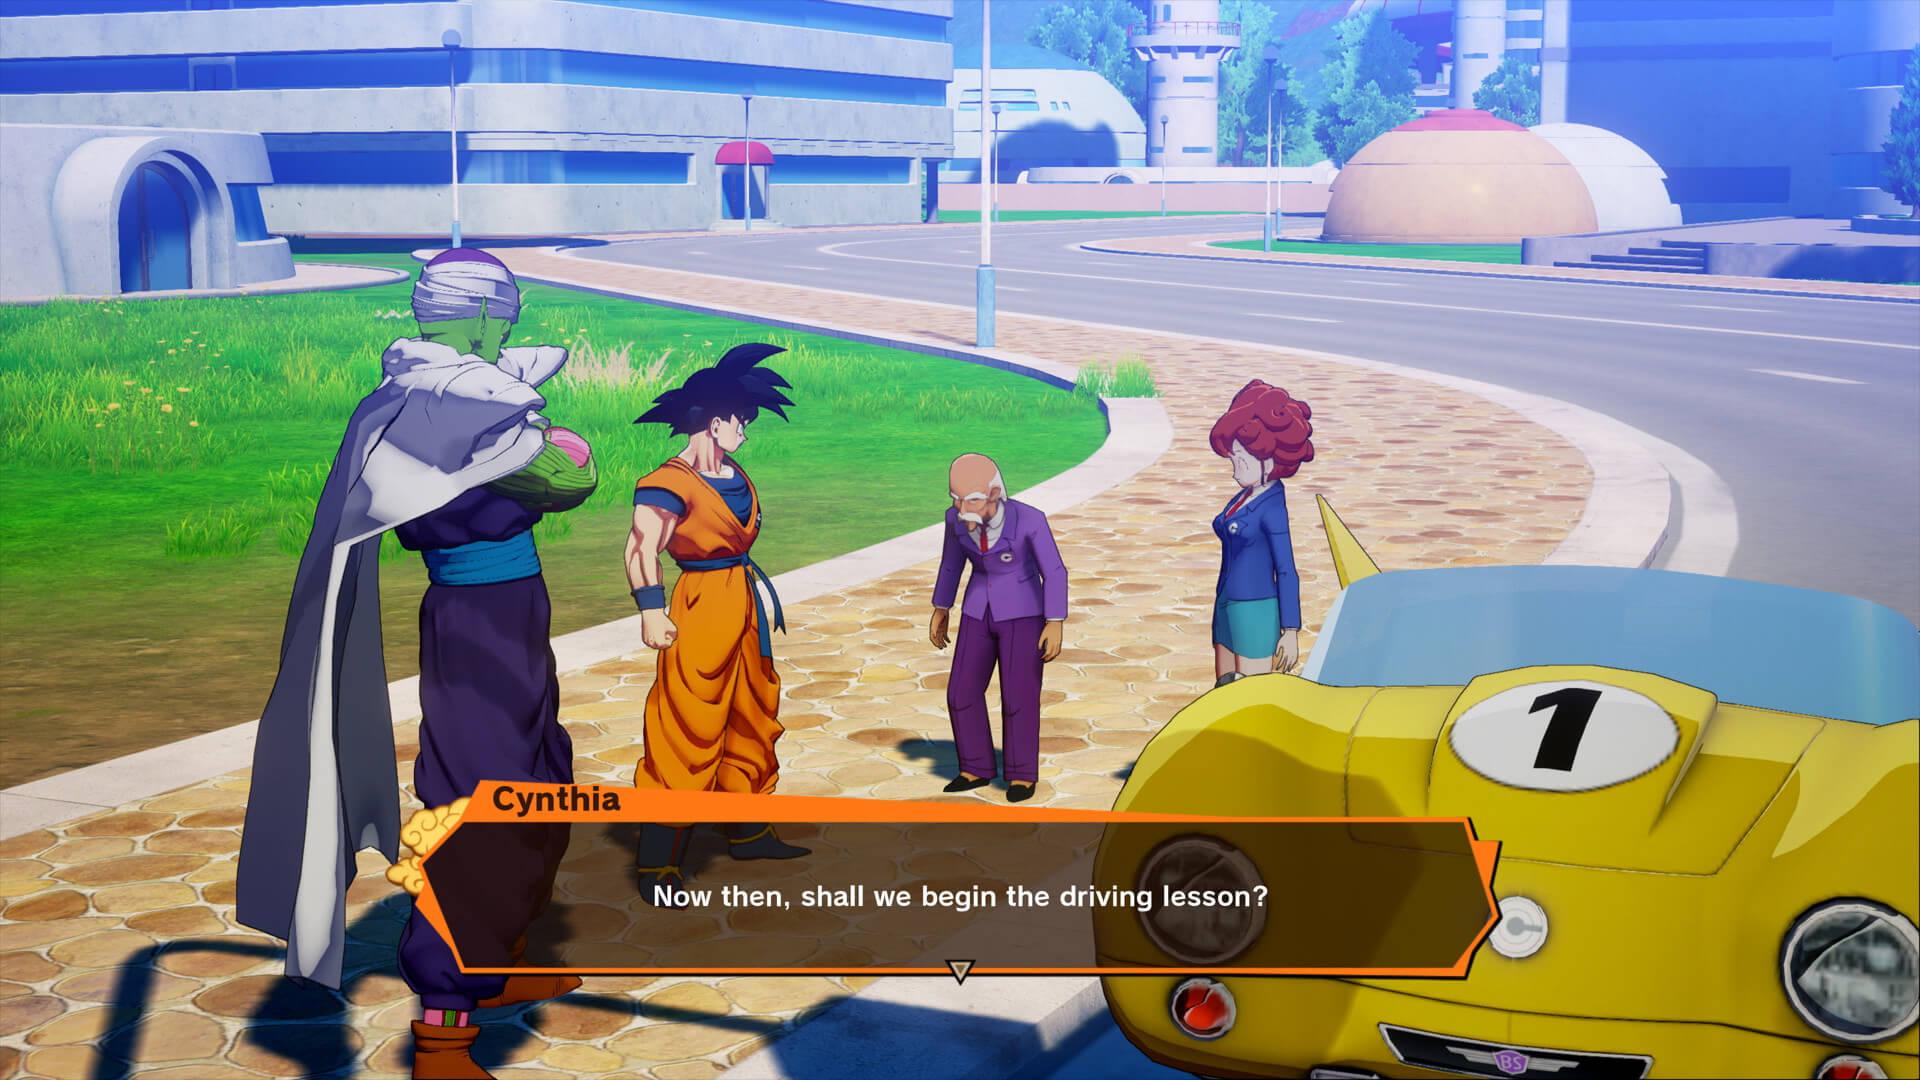 Скриншот из игры DRAGON BALL Z: KAKAROT